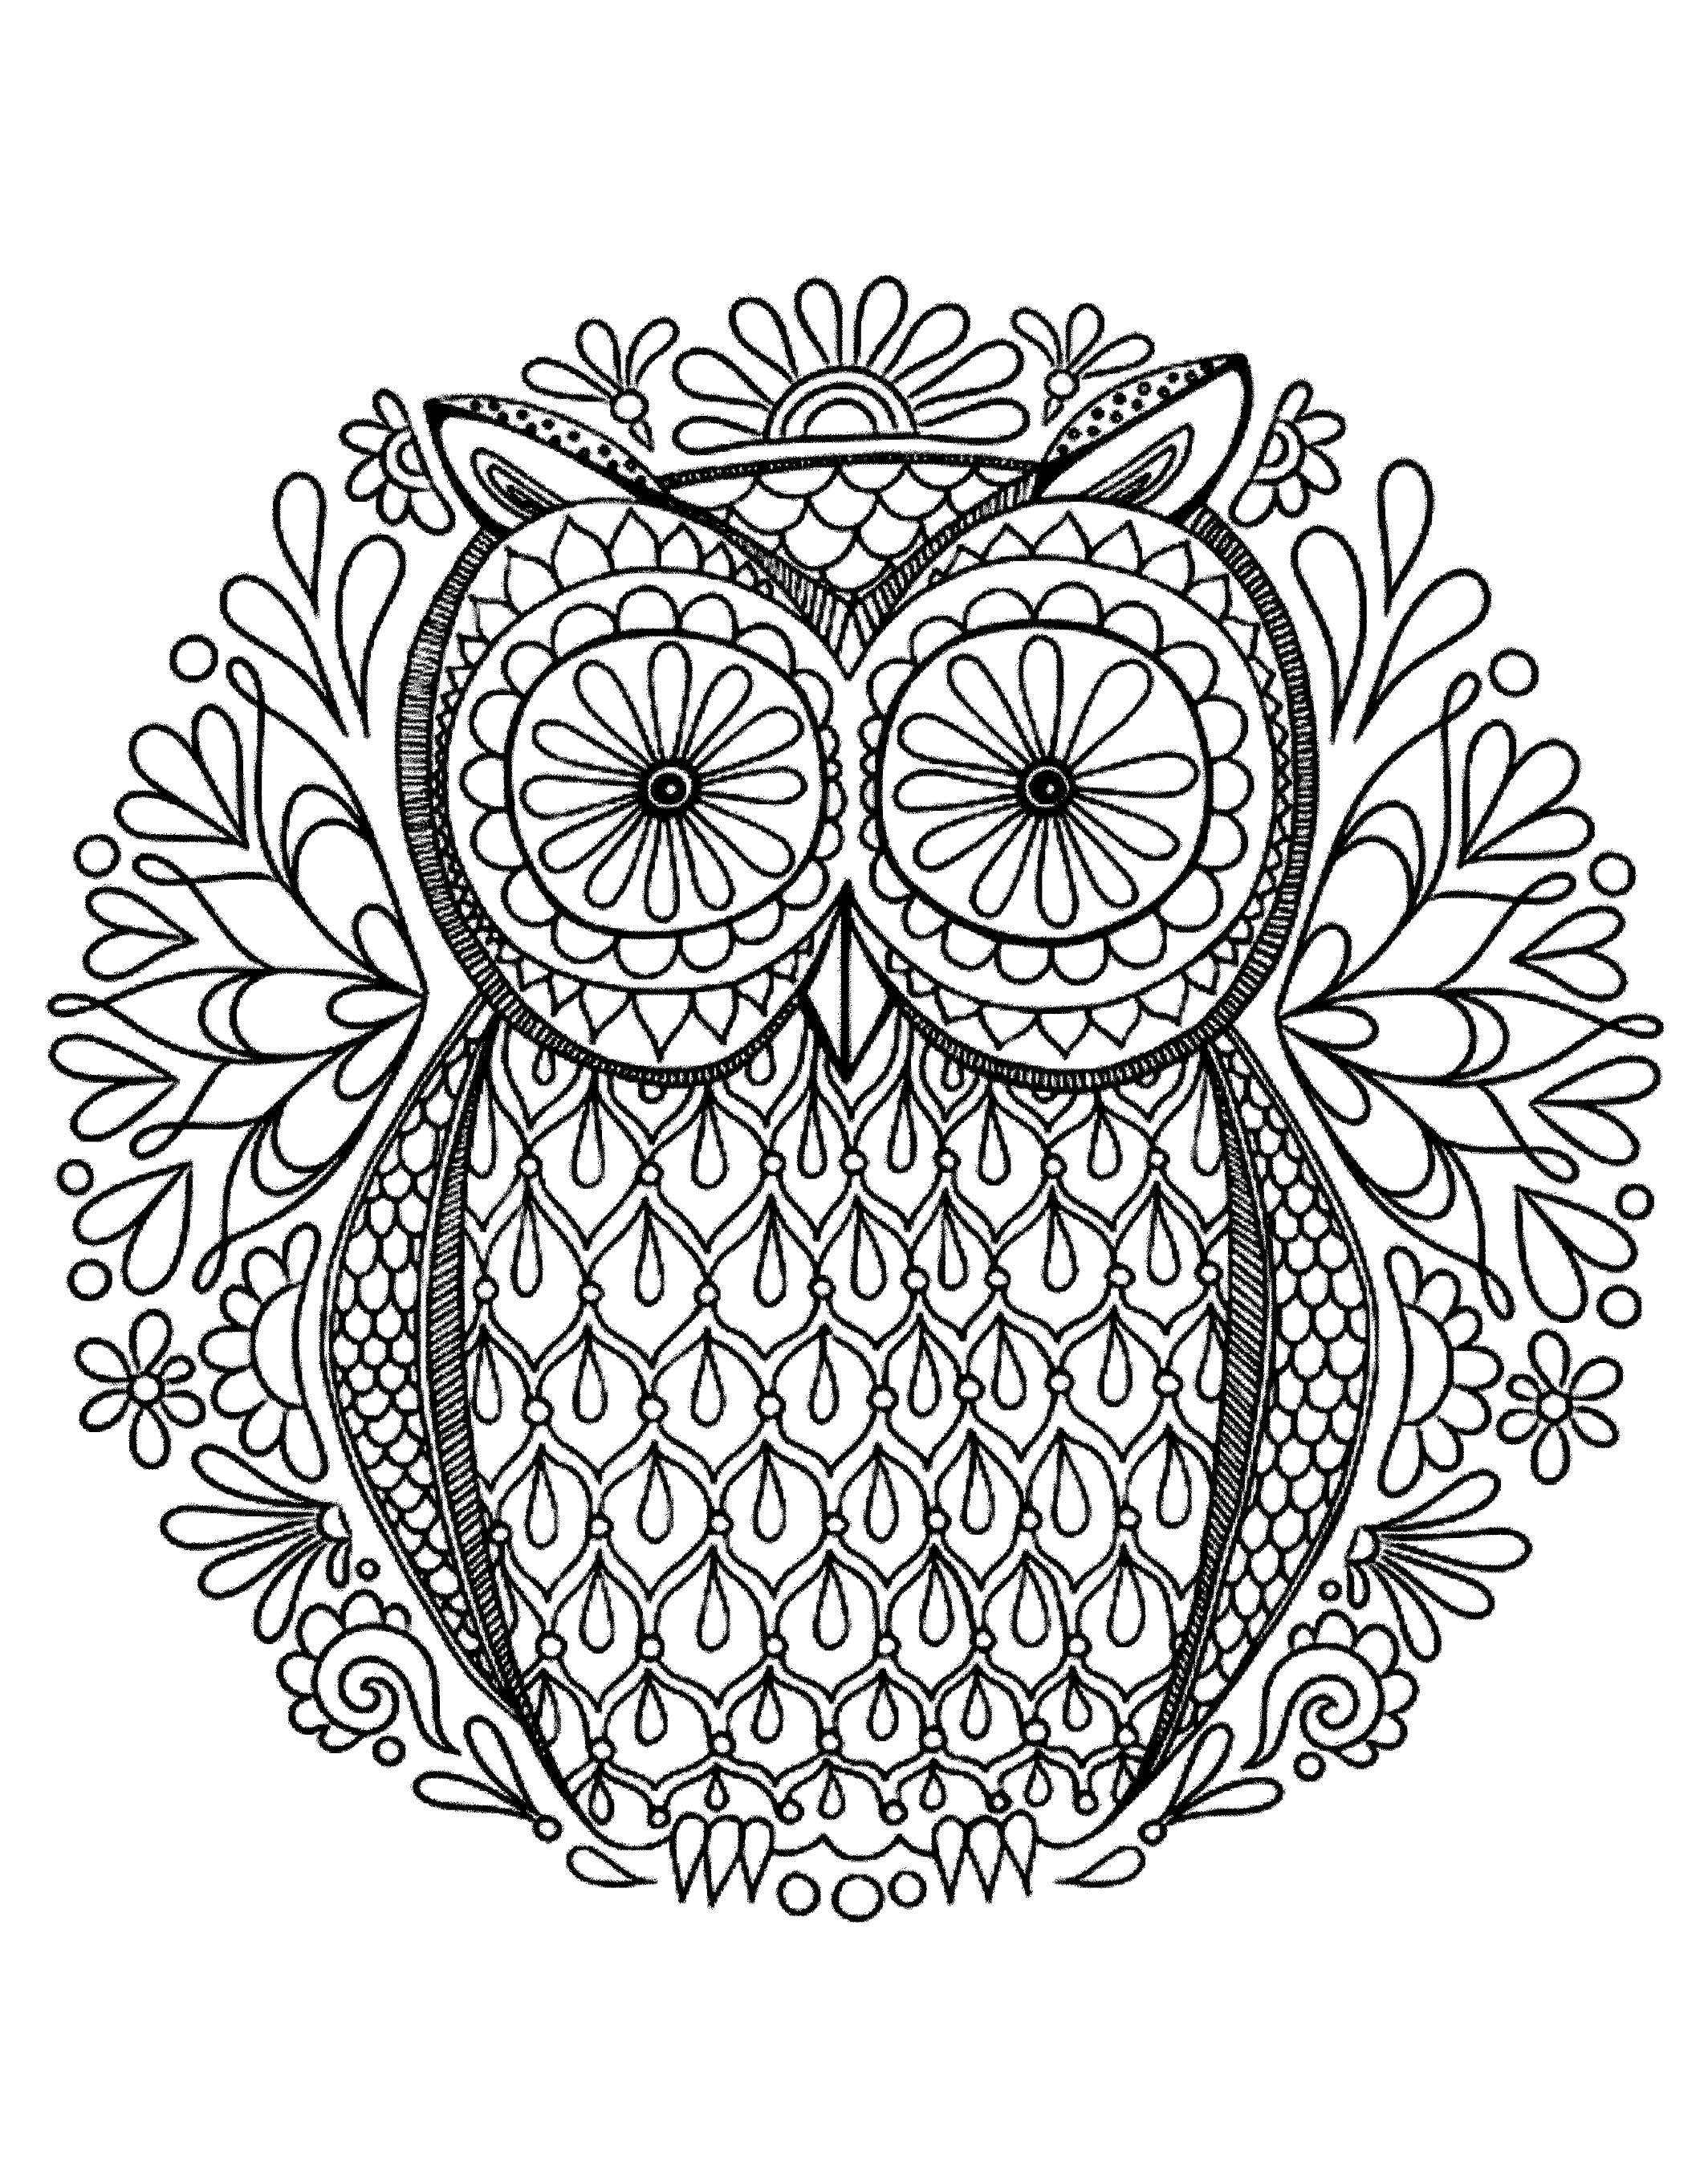 Simple owl in a circular design